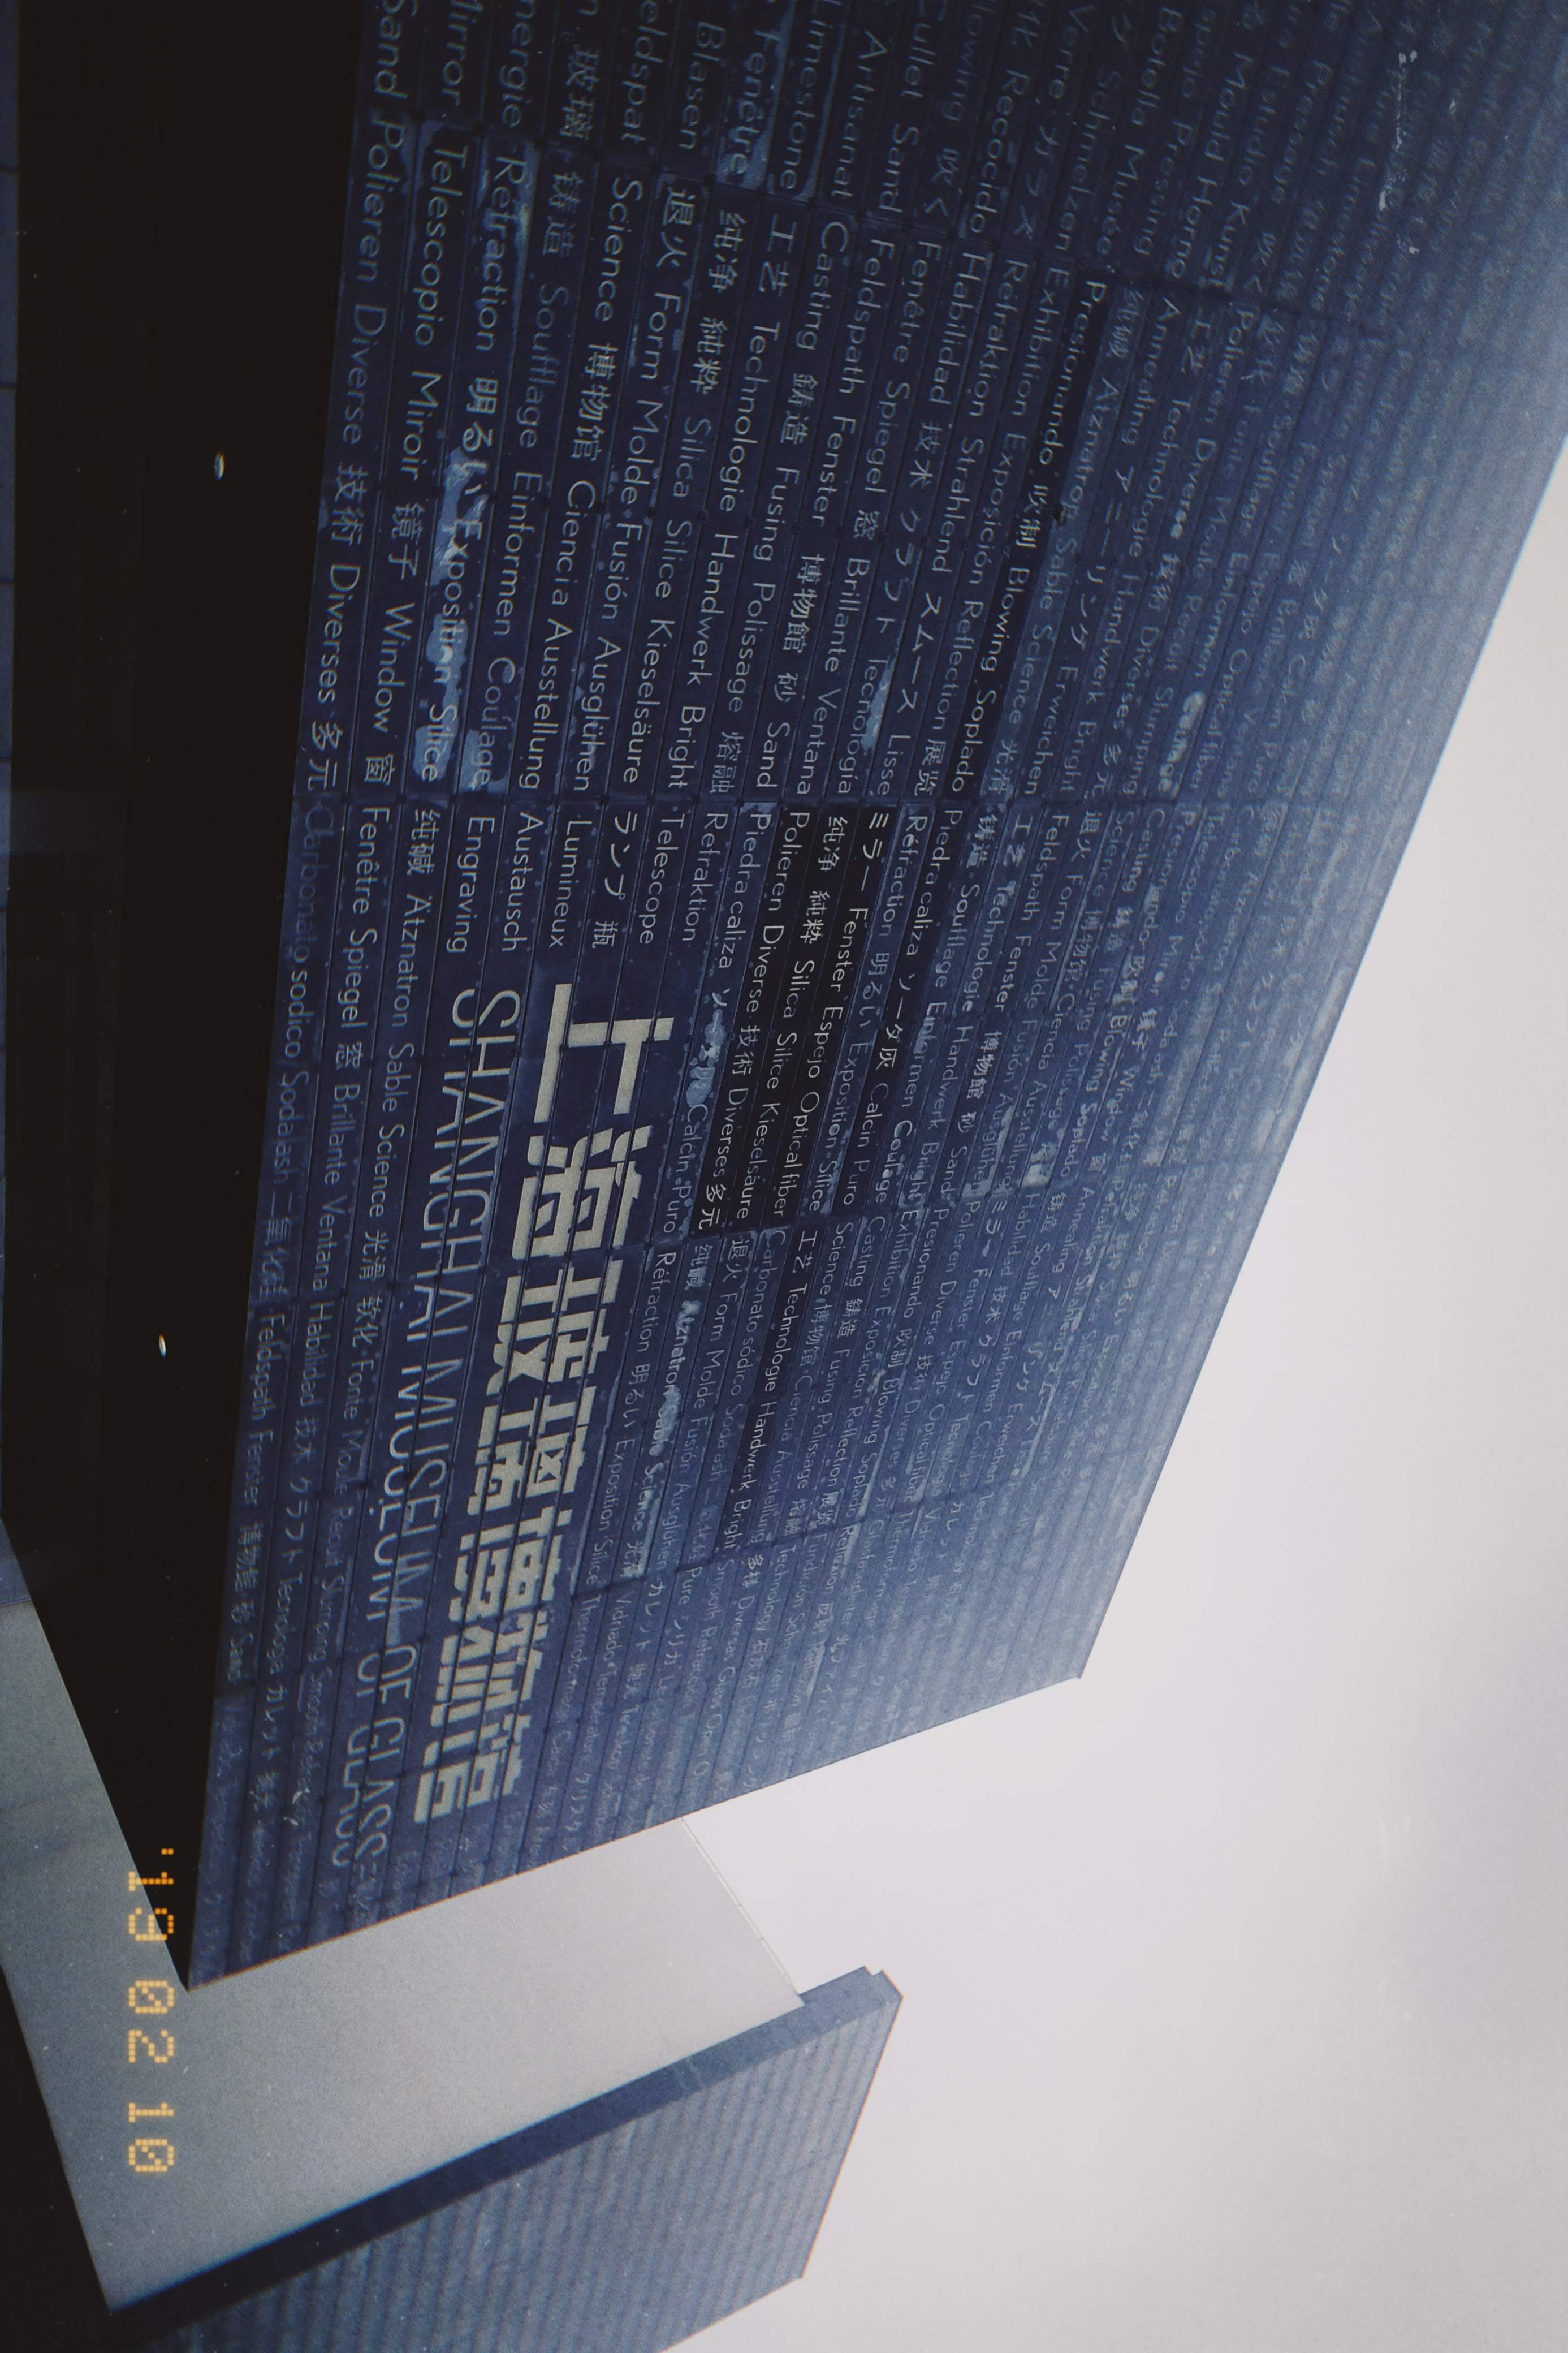 shanghai-museum-of-glass.jpg